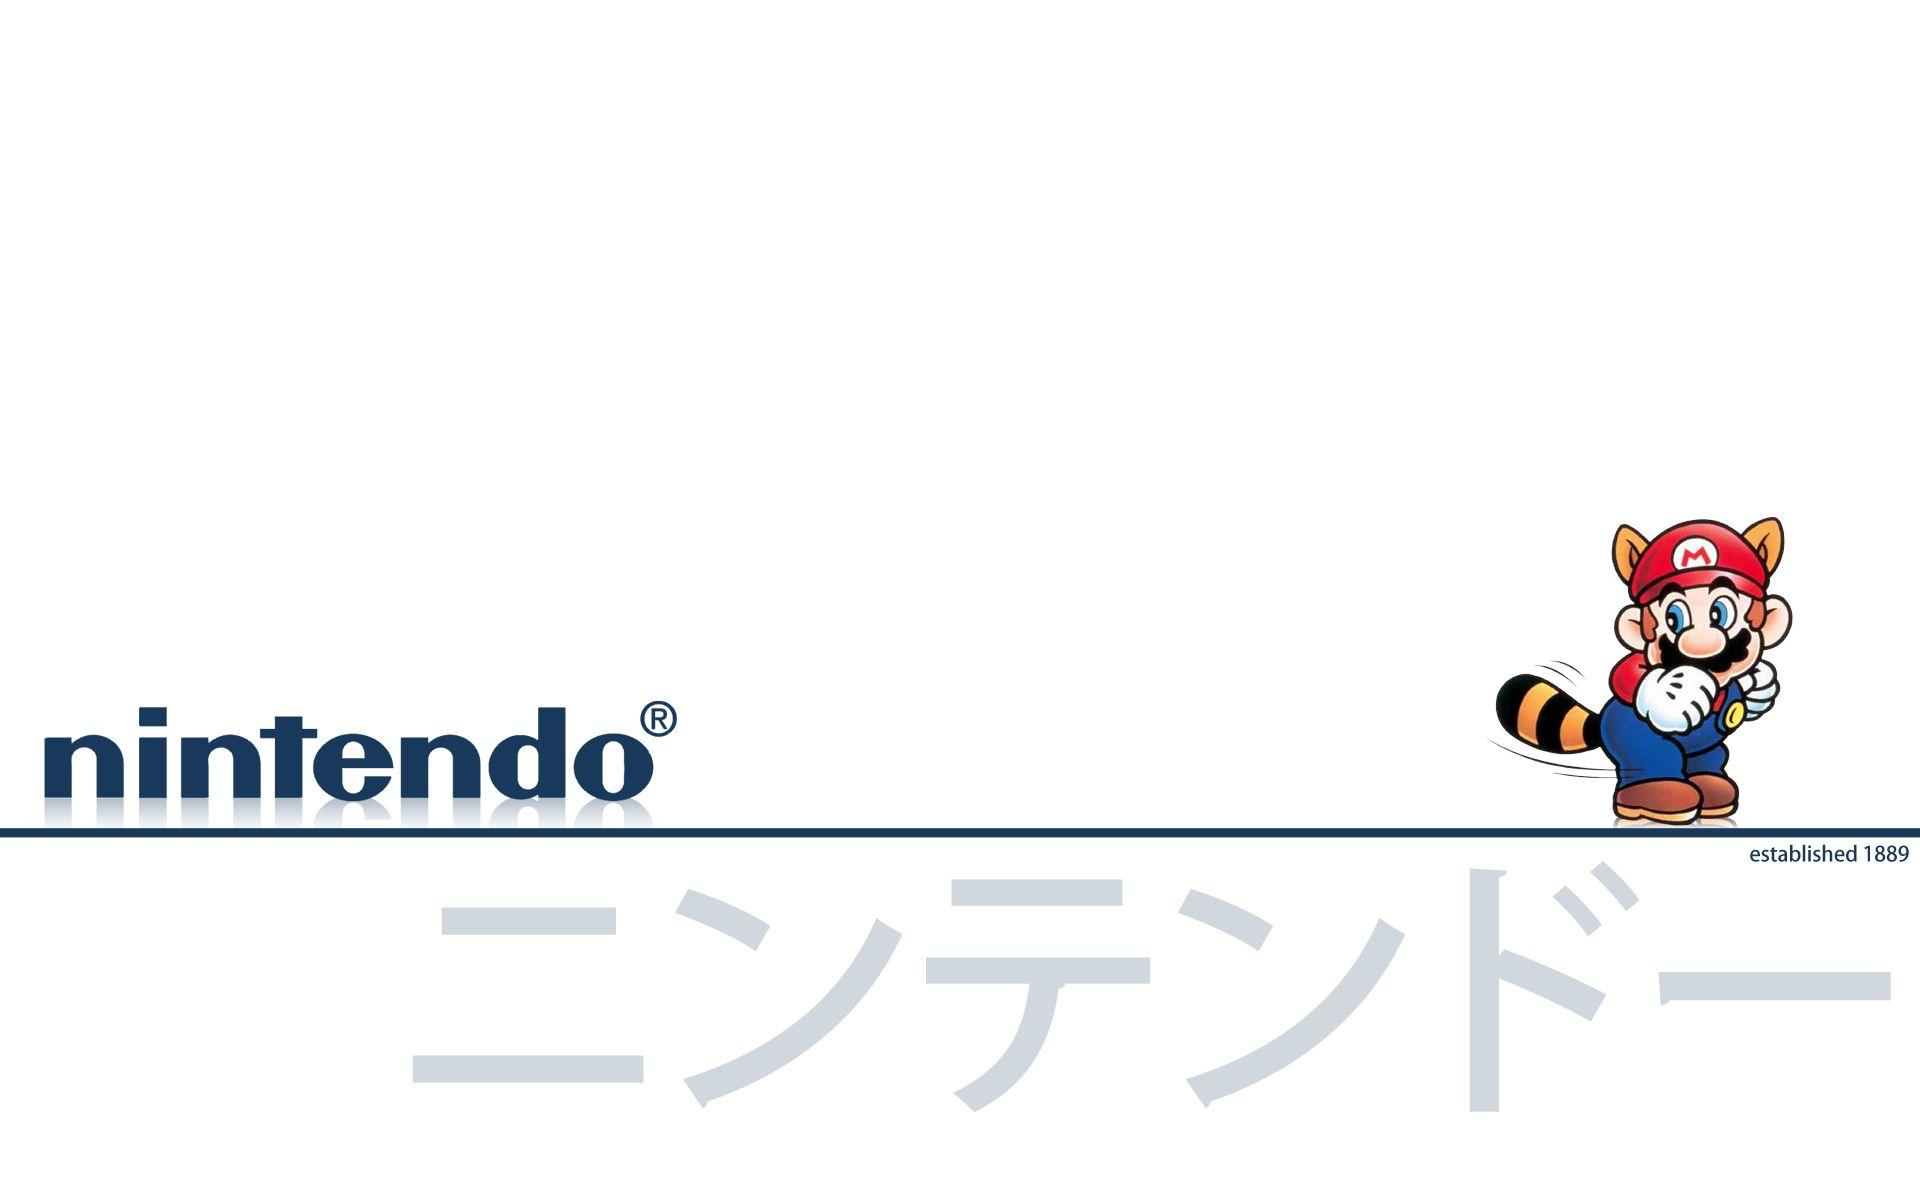 Nintendo Wallpapers - Wallpaper Cave